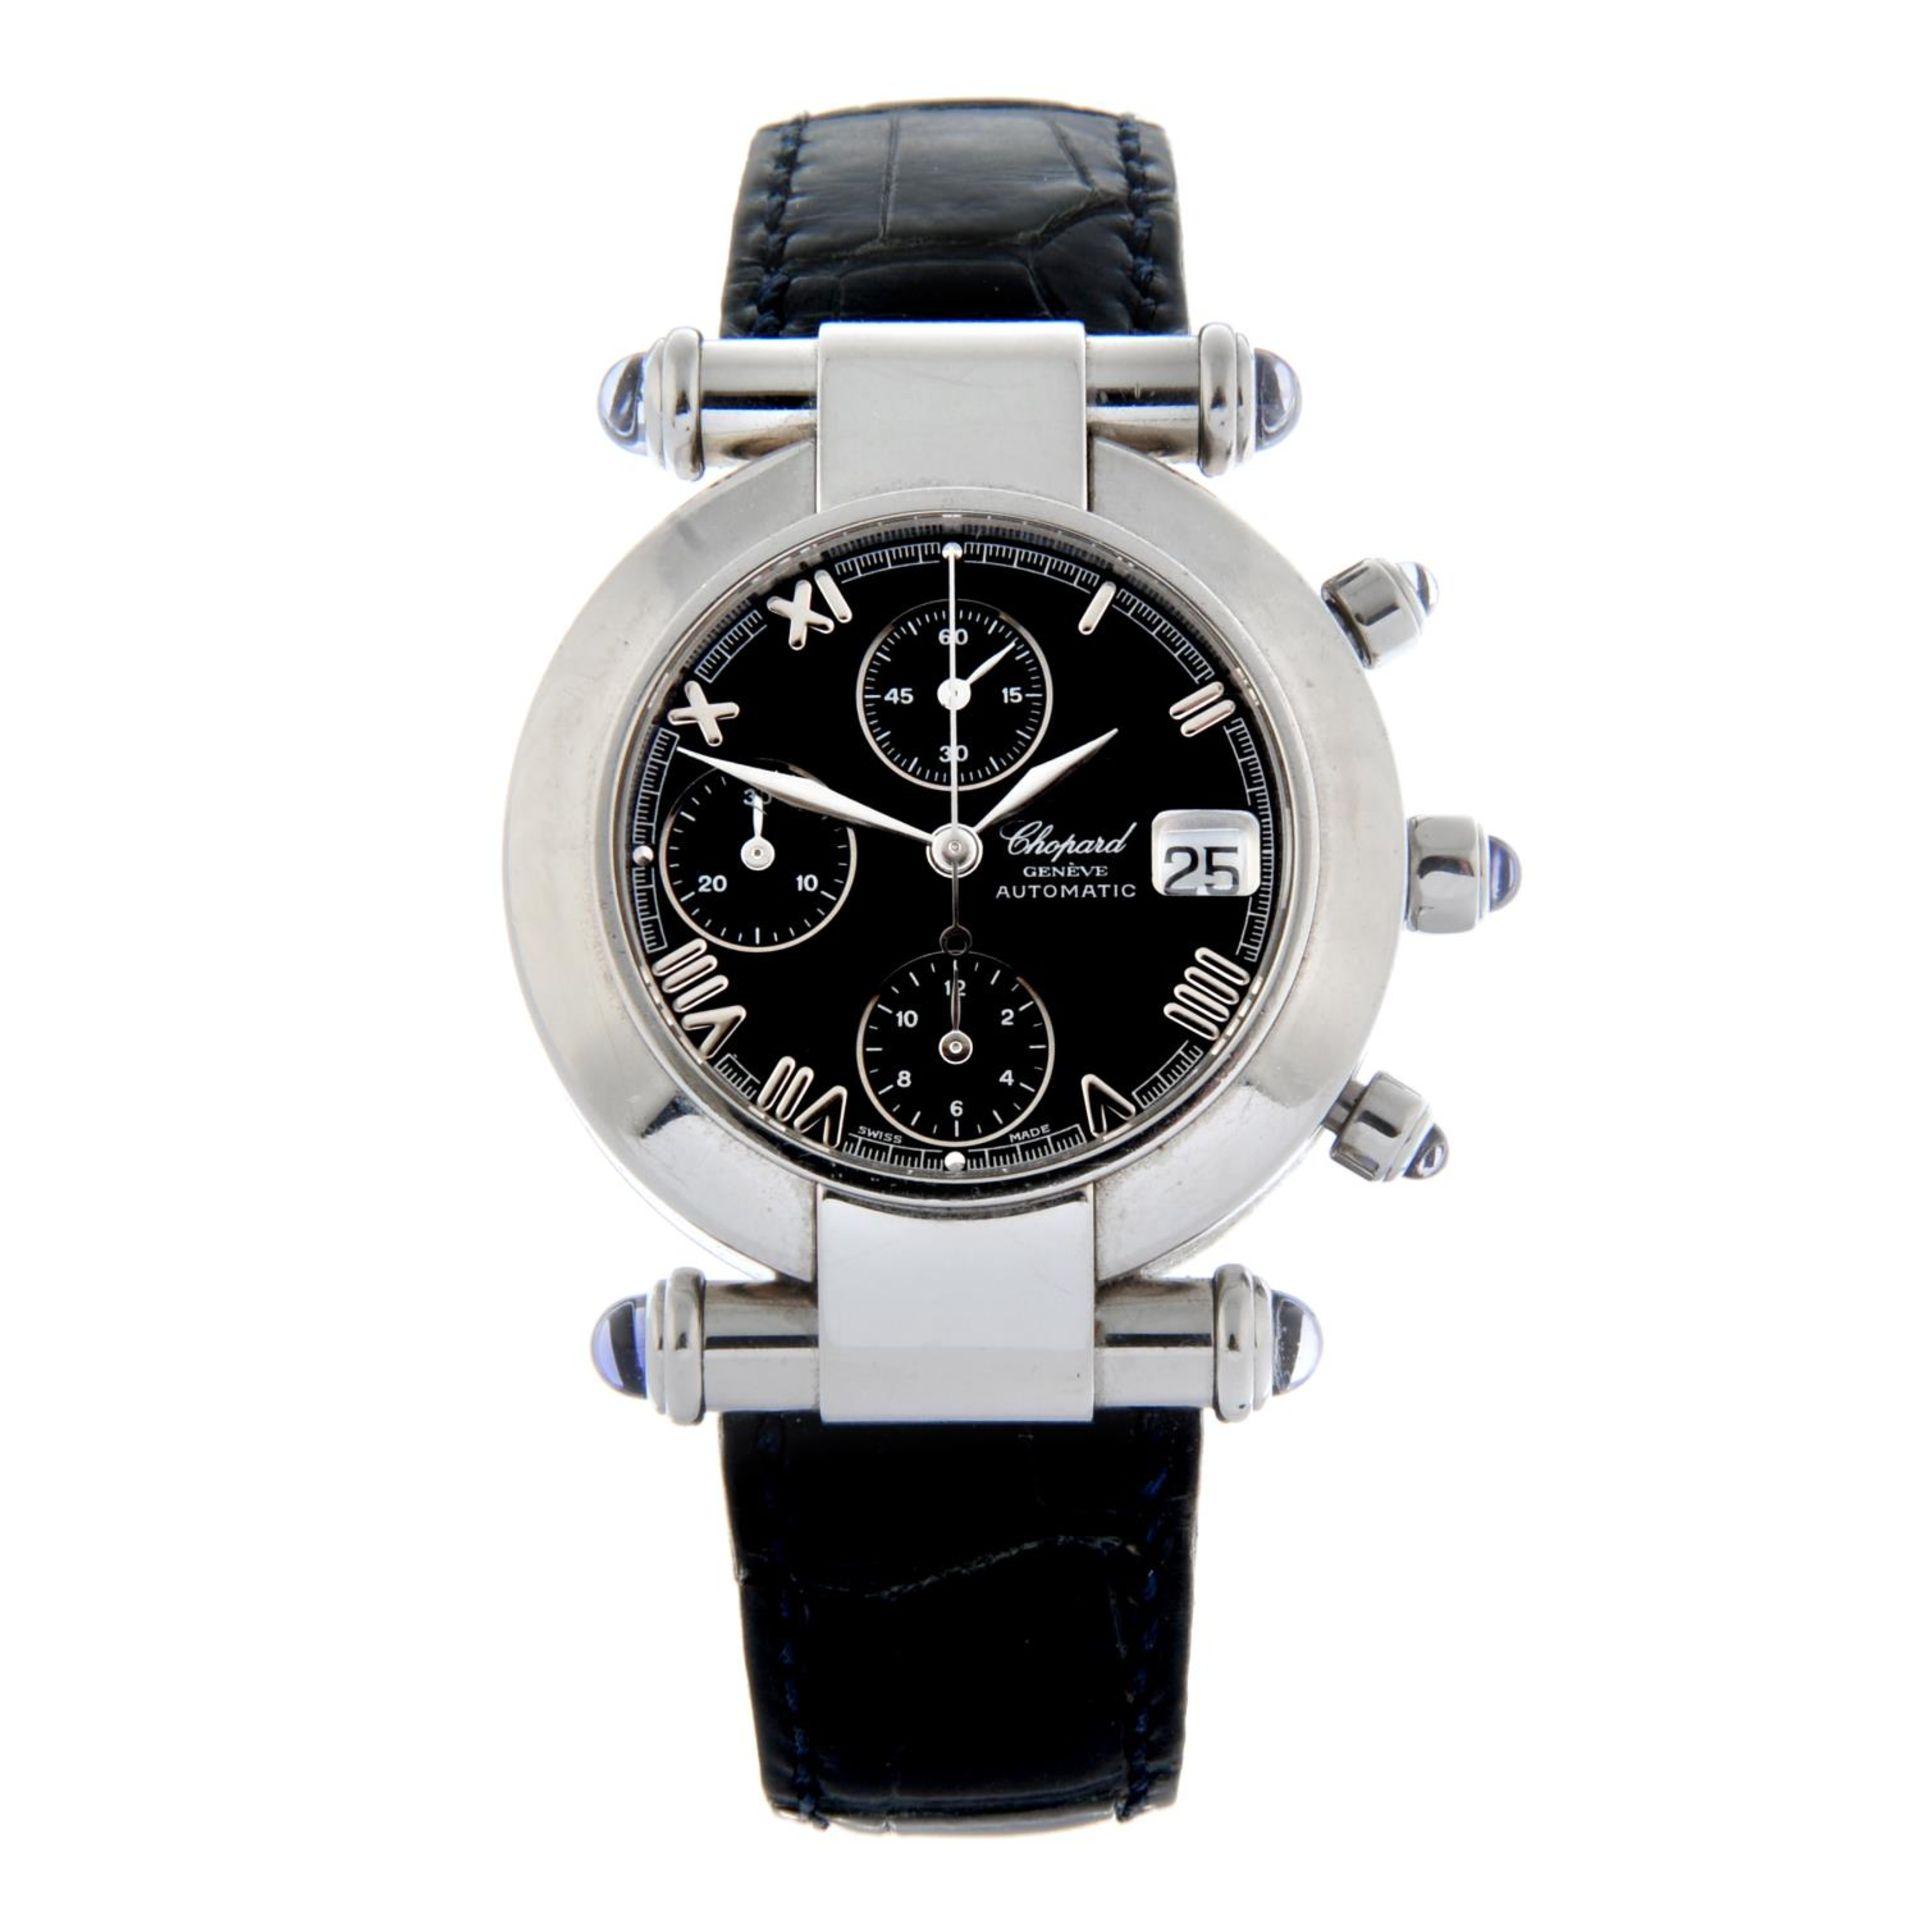 CHOPARD - an Imperiale chronograph wrist watch.